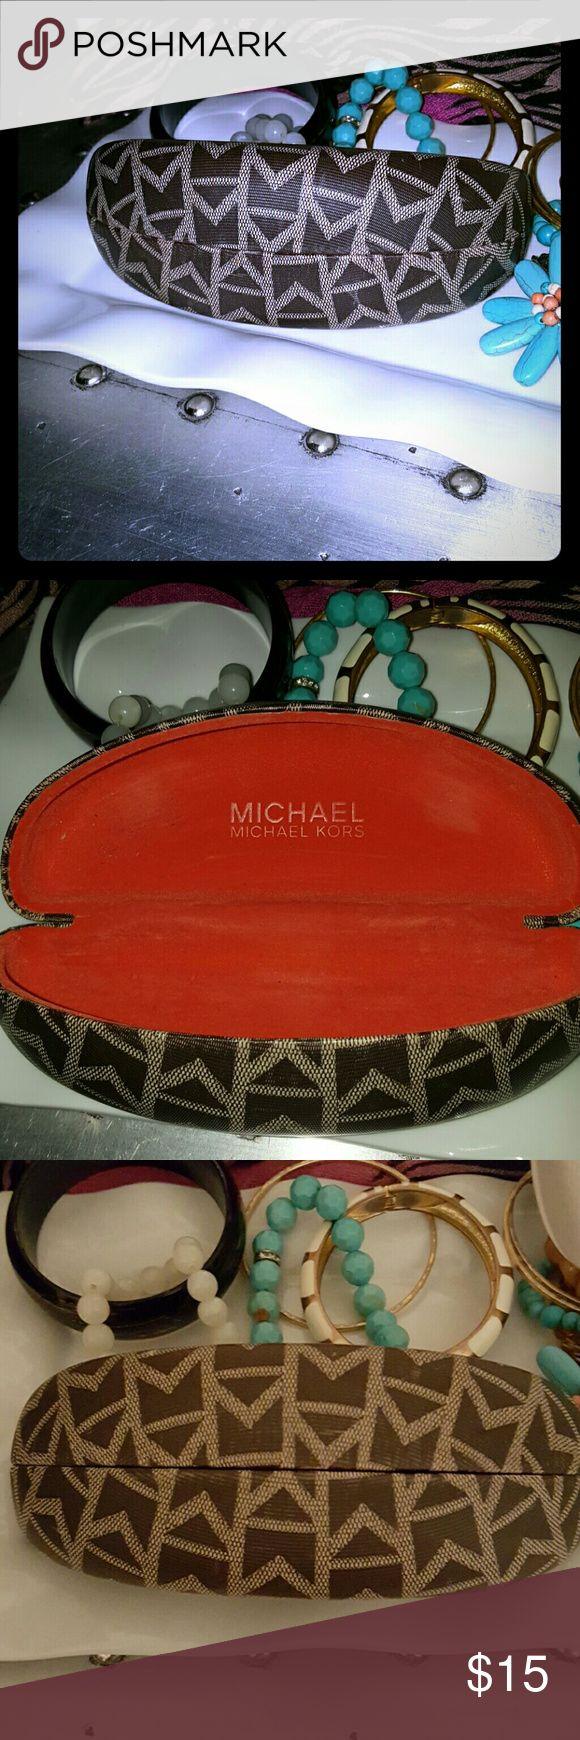 Michael Kors sunglass case Michael Michael Kors Signature Sunglass Case MICHAEL Michael Kors Accessories Sunglasses